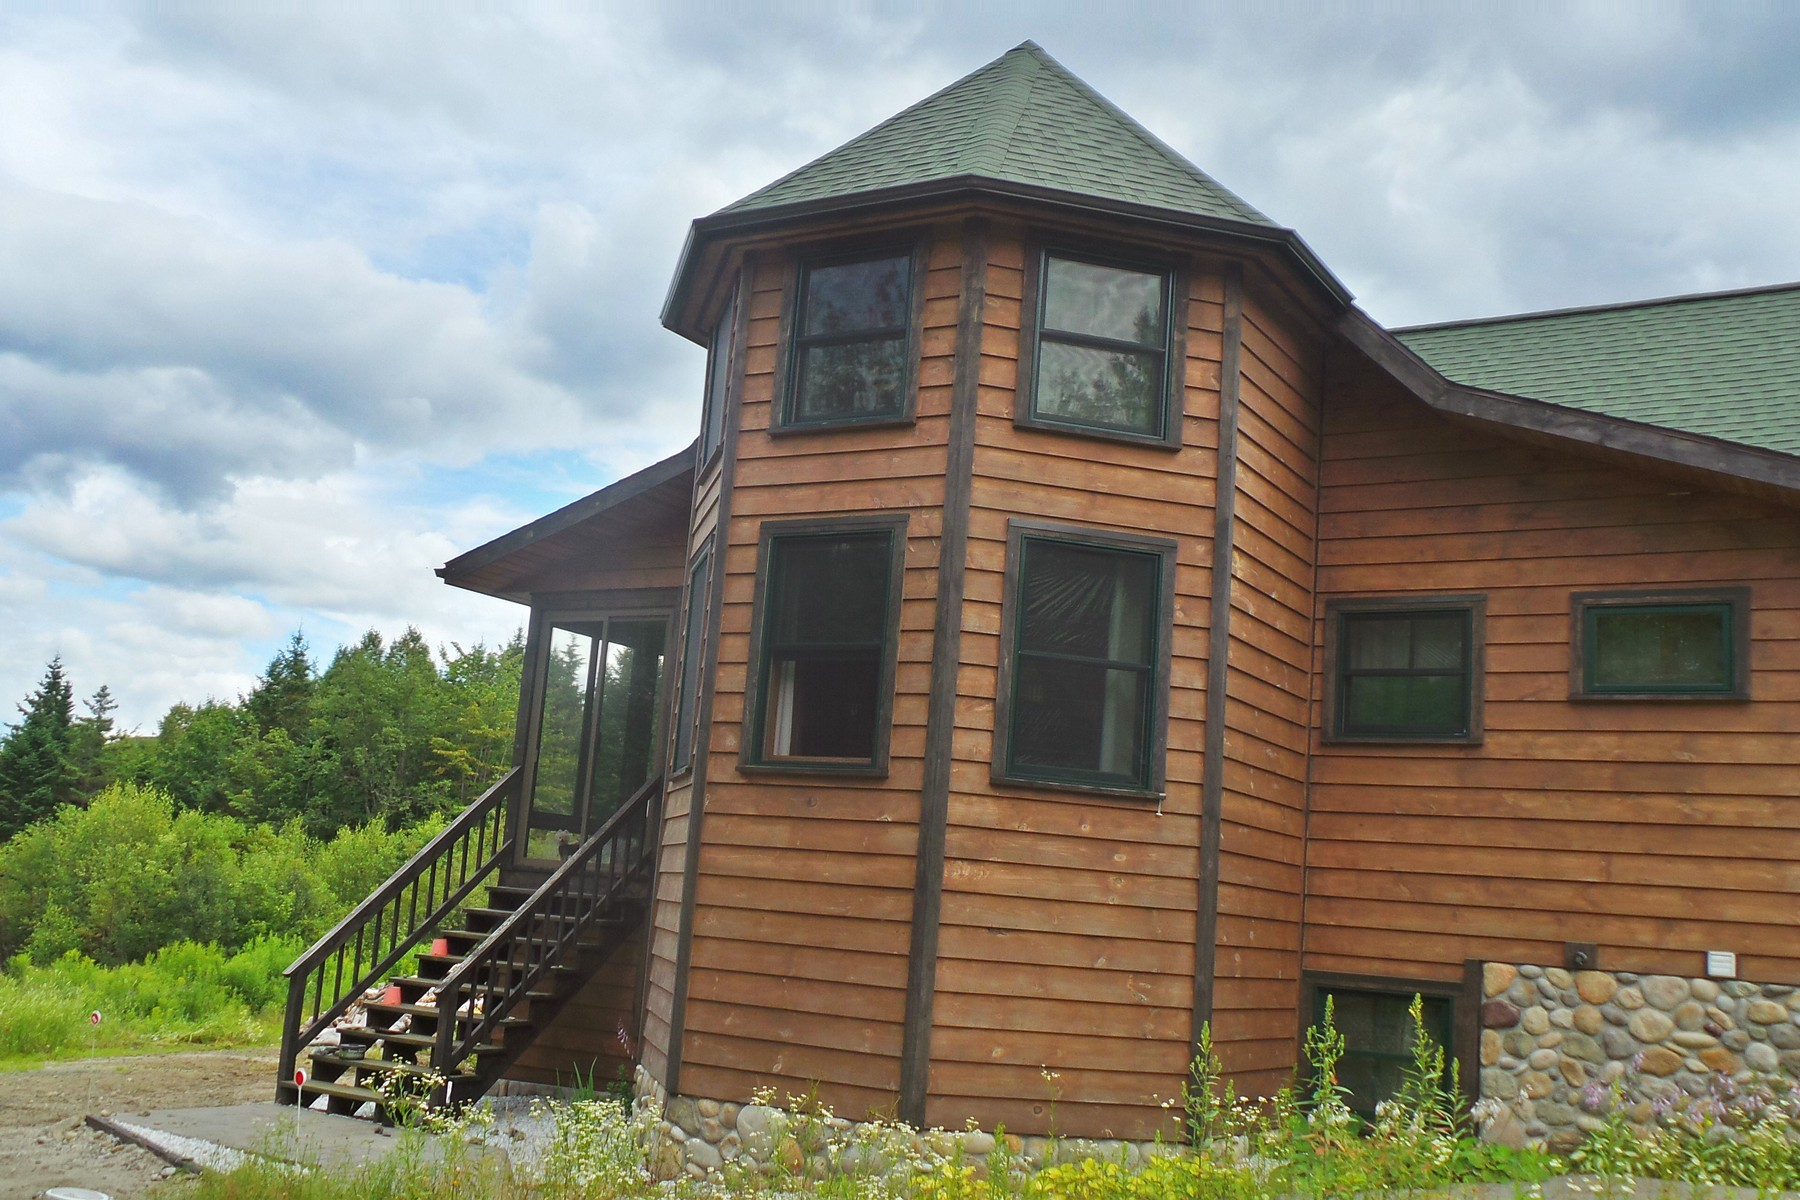 Casa Unifamiliar por un Venta en Captivating Contempory 515 Calhoun Rd Charleston, Vermont 05833 Estados Unidos